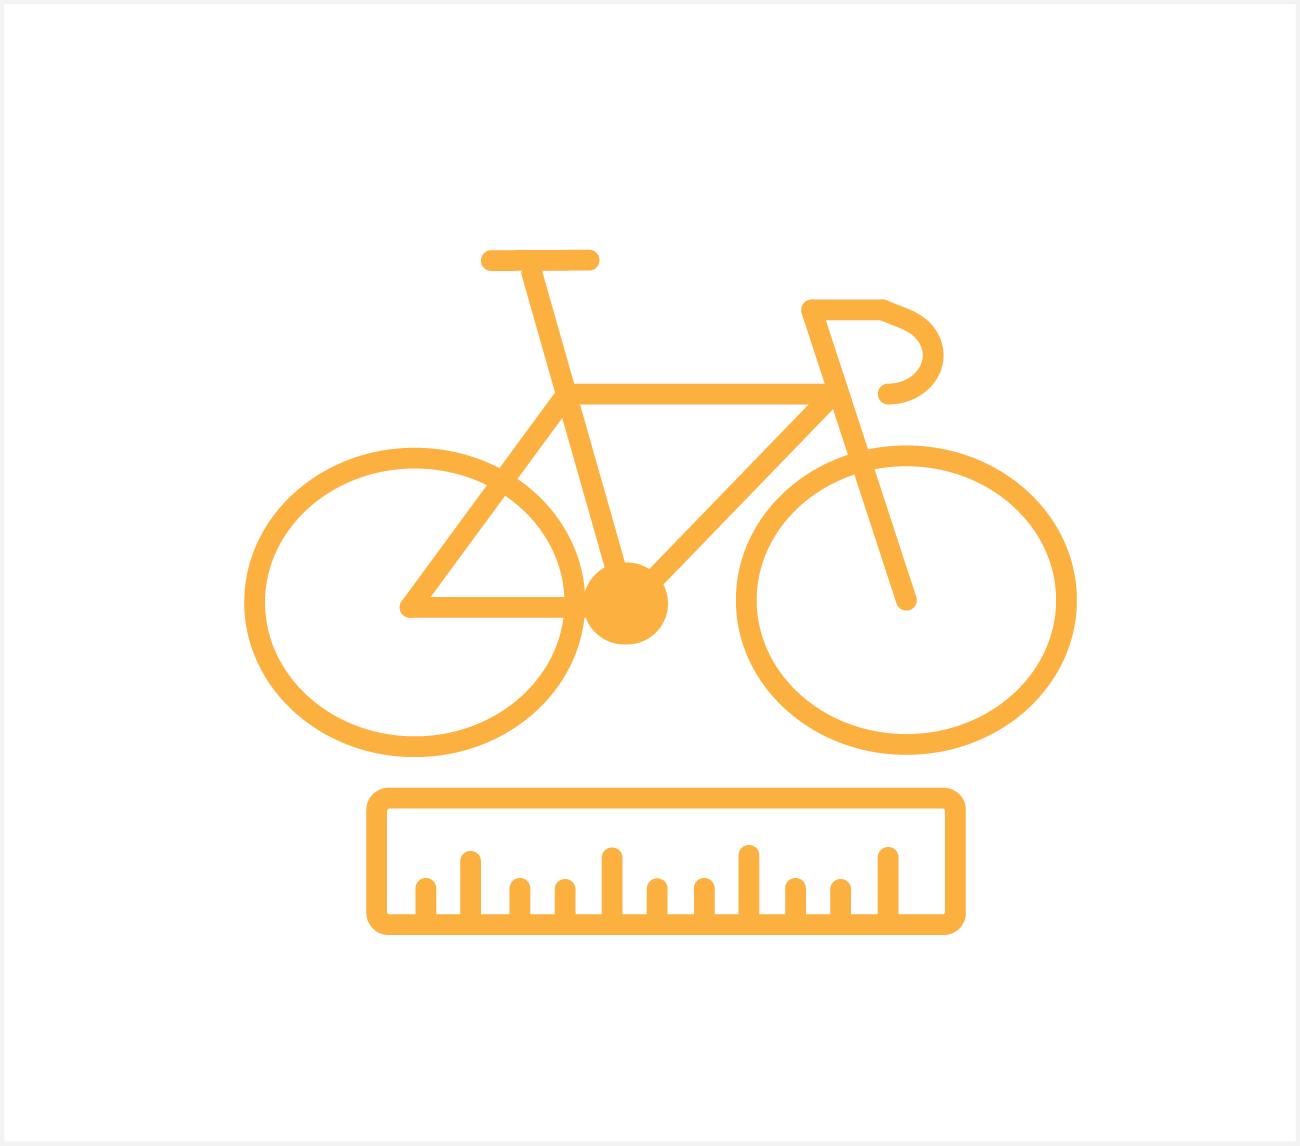 standaard fietspos. 1 fiets